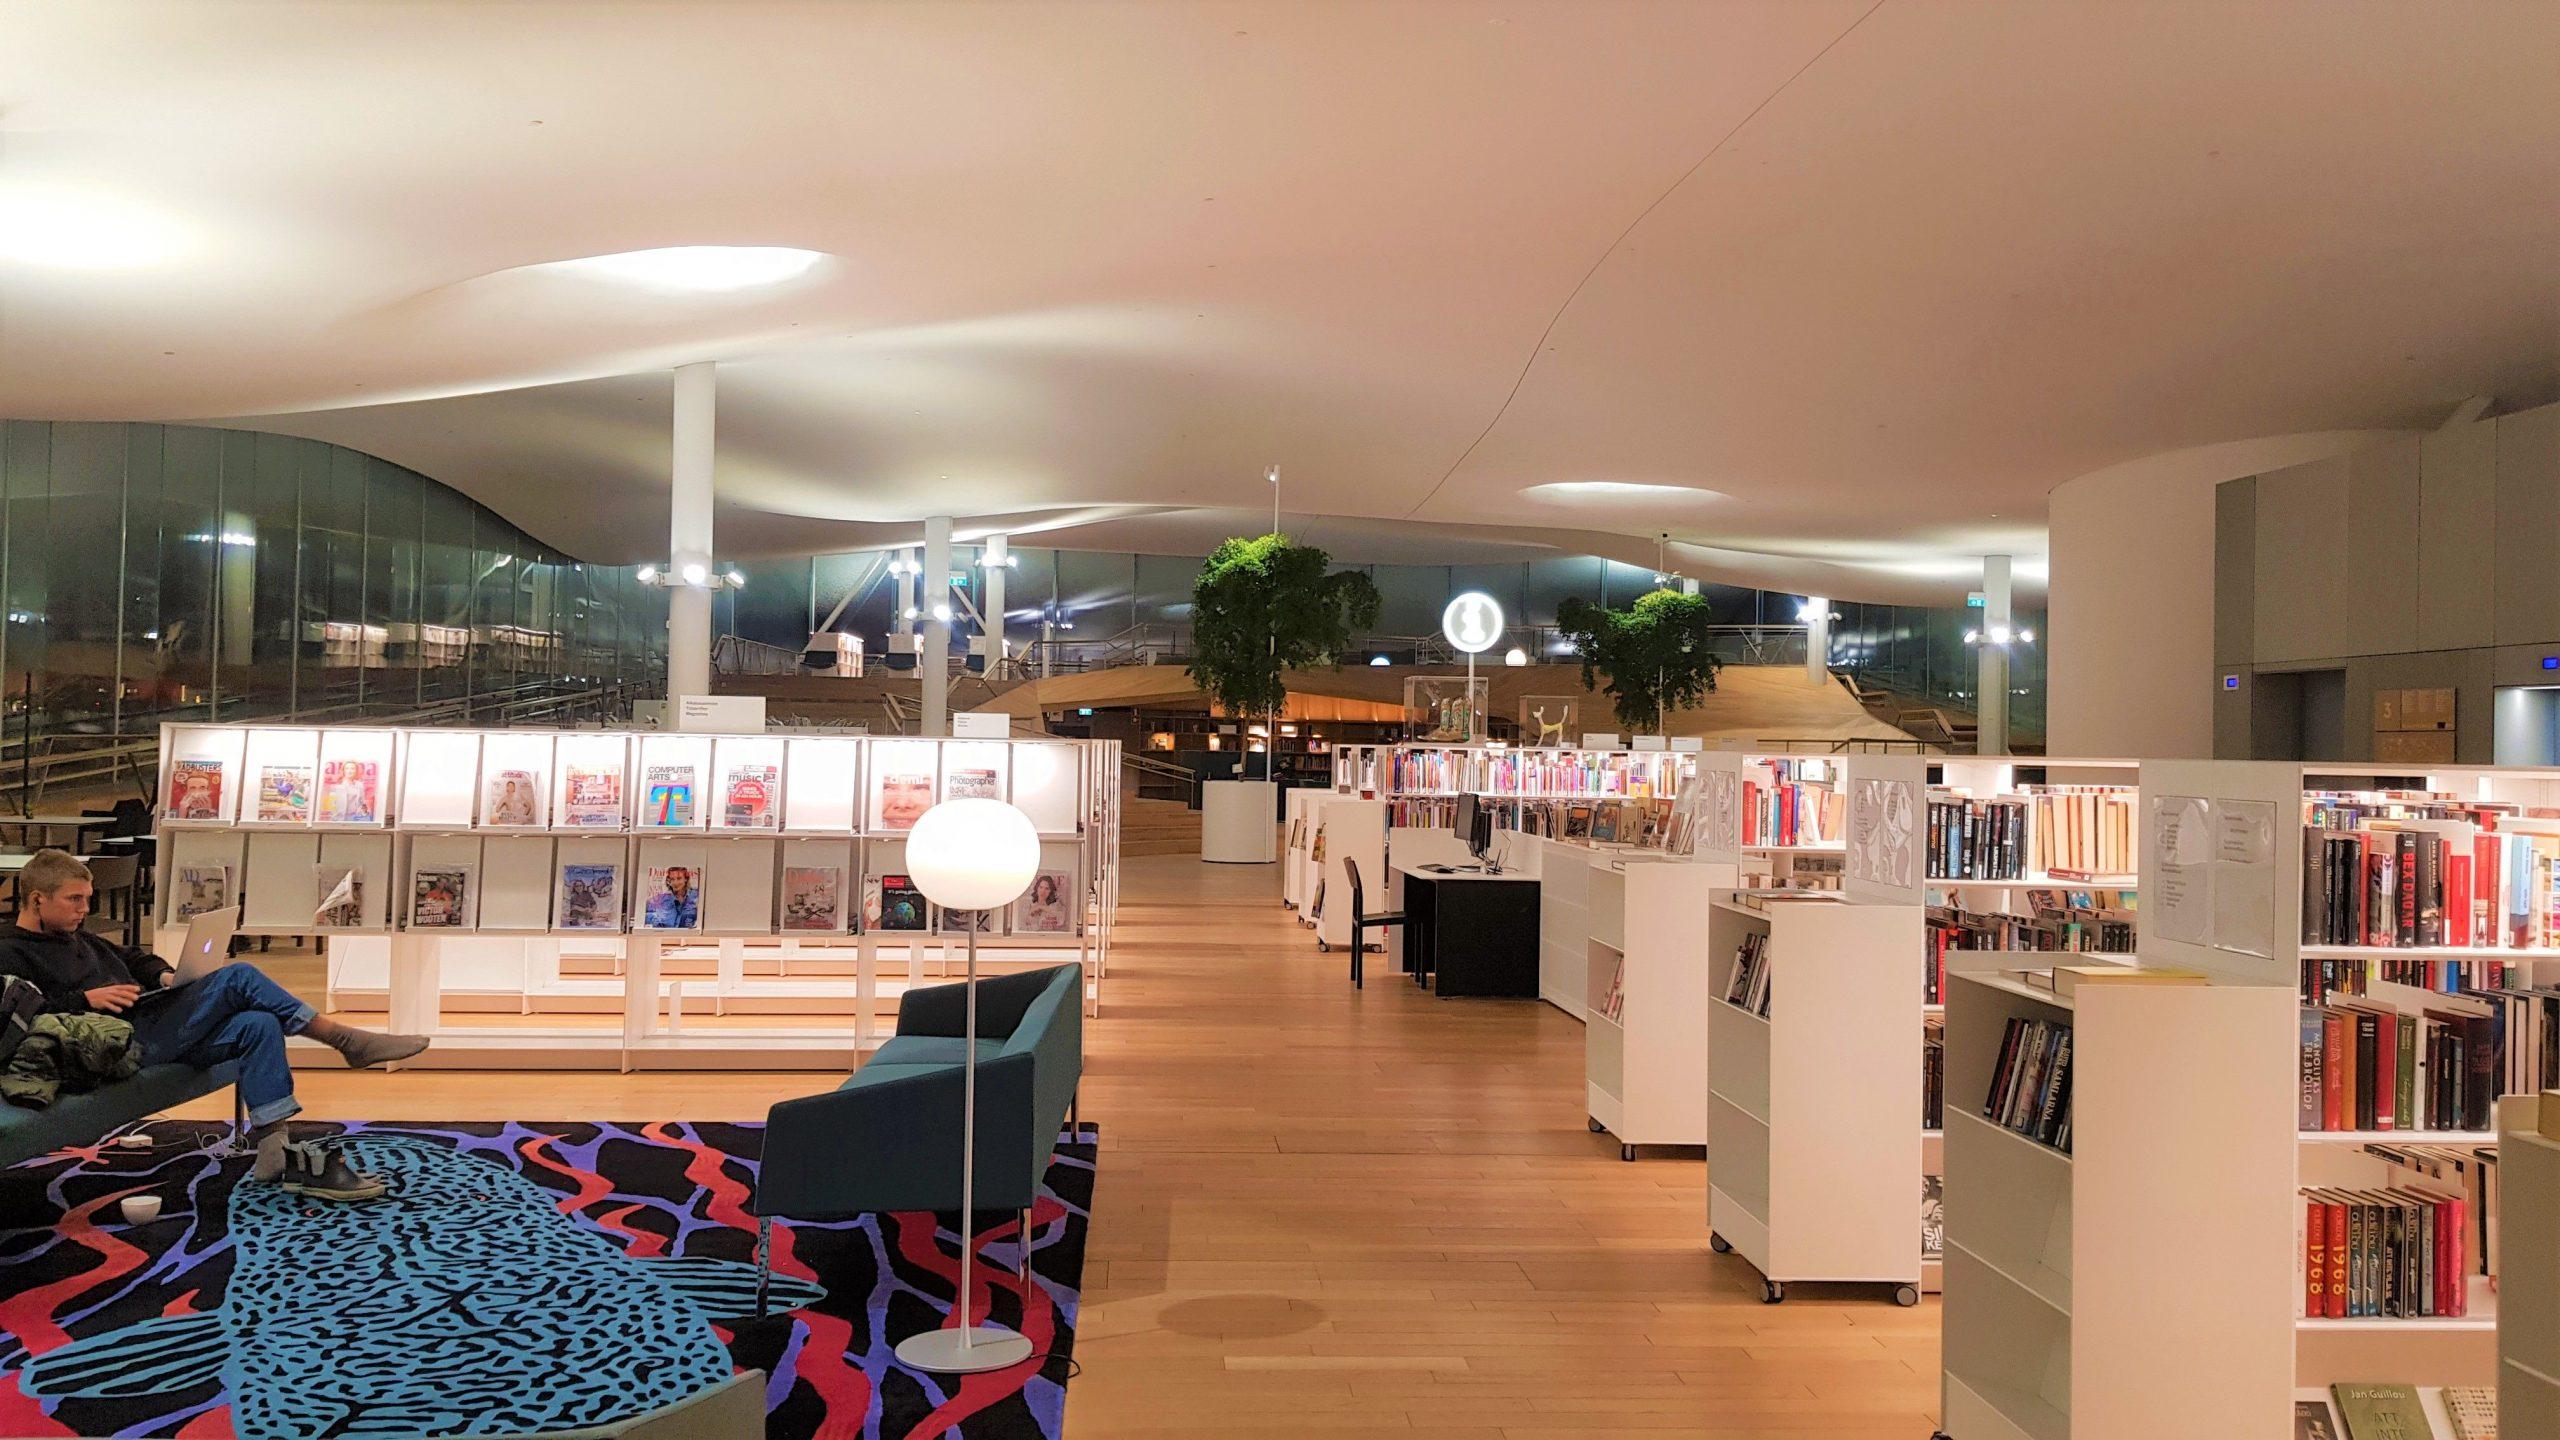 Interior del tercer piso de la biblioteca oodi.